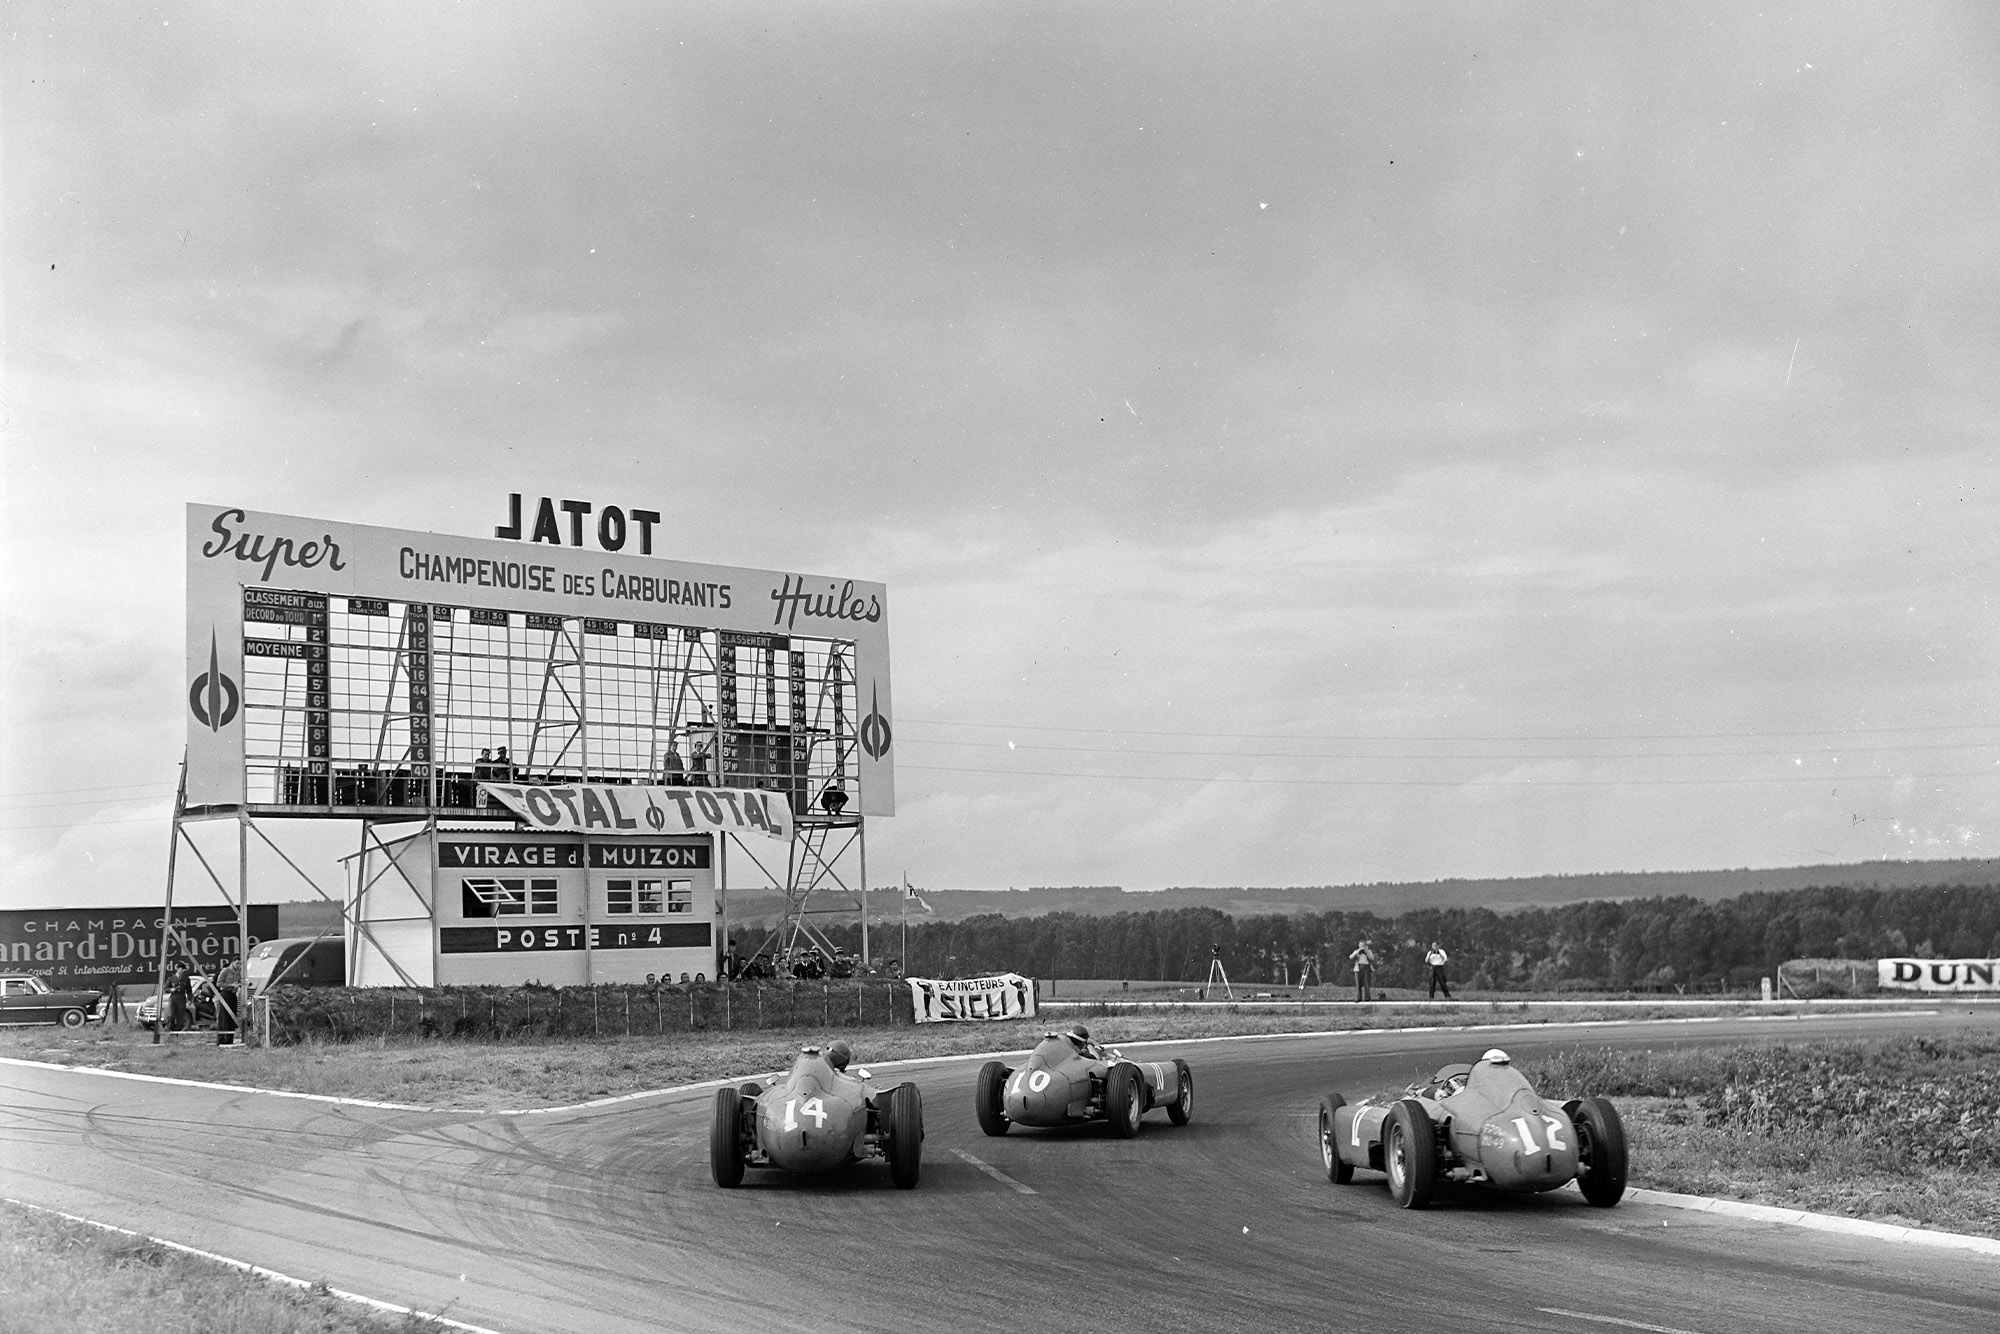 The Ferraris battle on